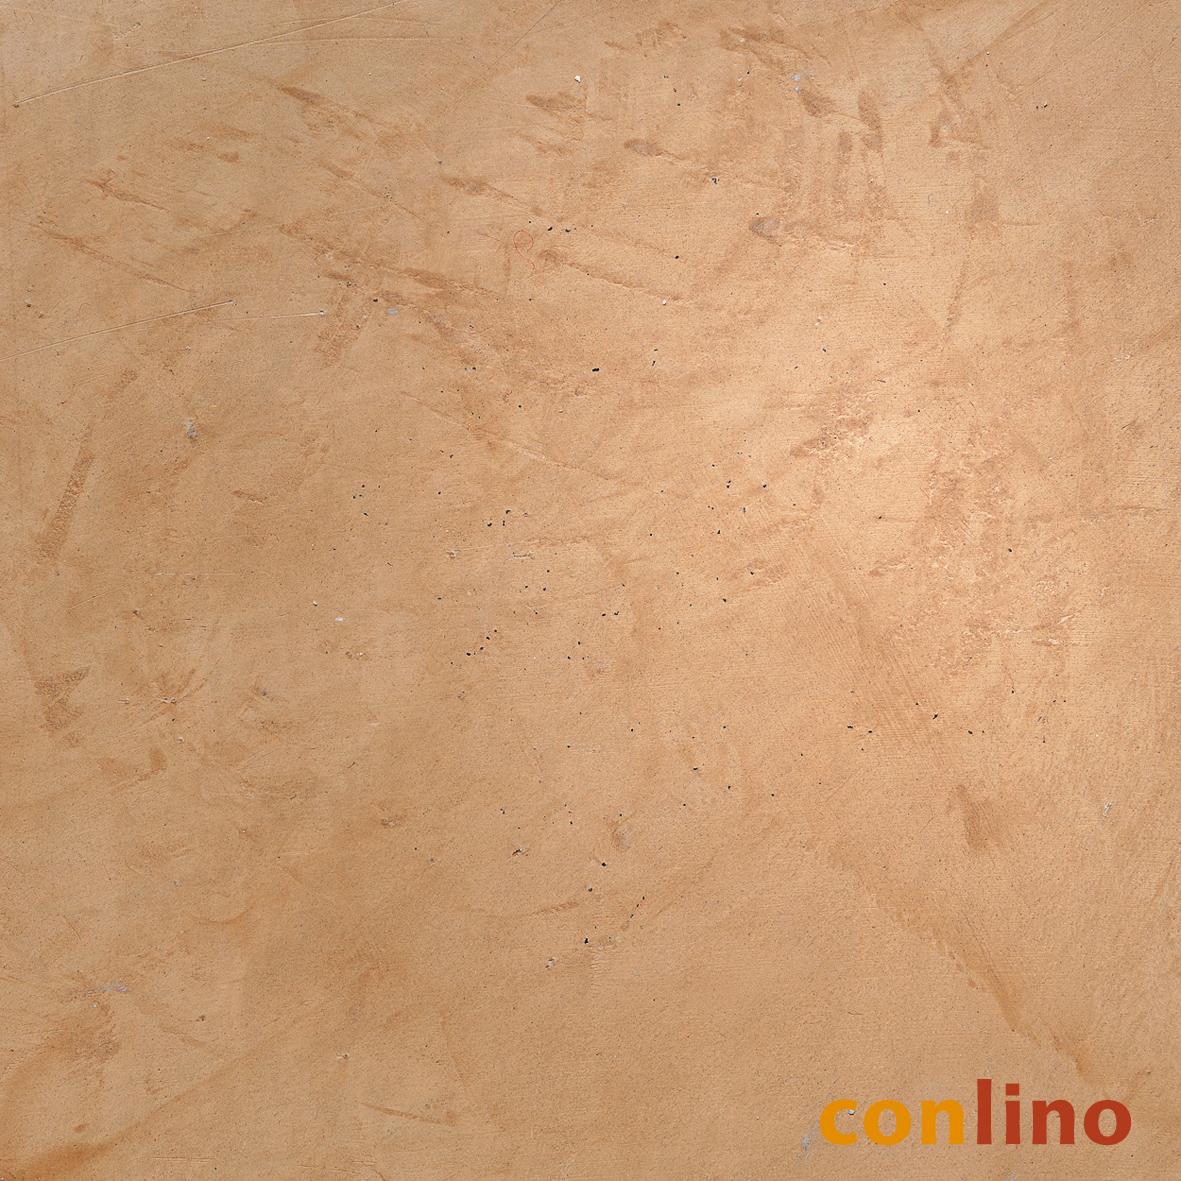 conlino Lehm-Glätte Barro Tinaja CG 113